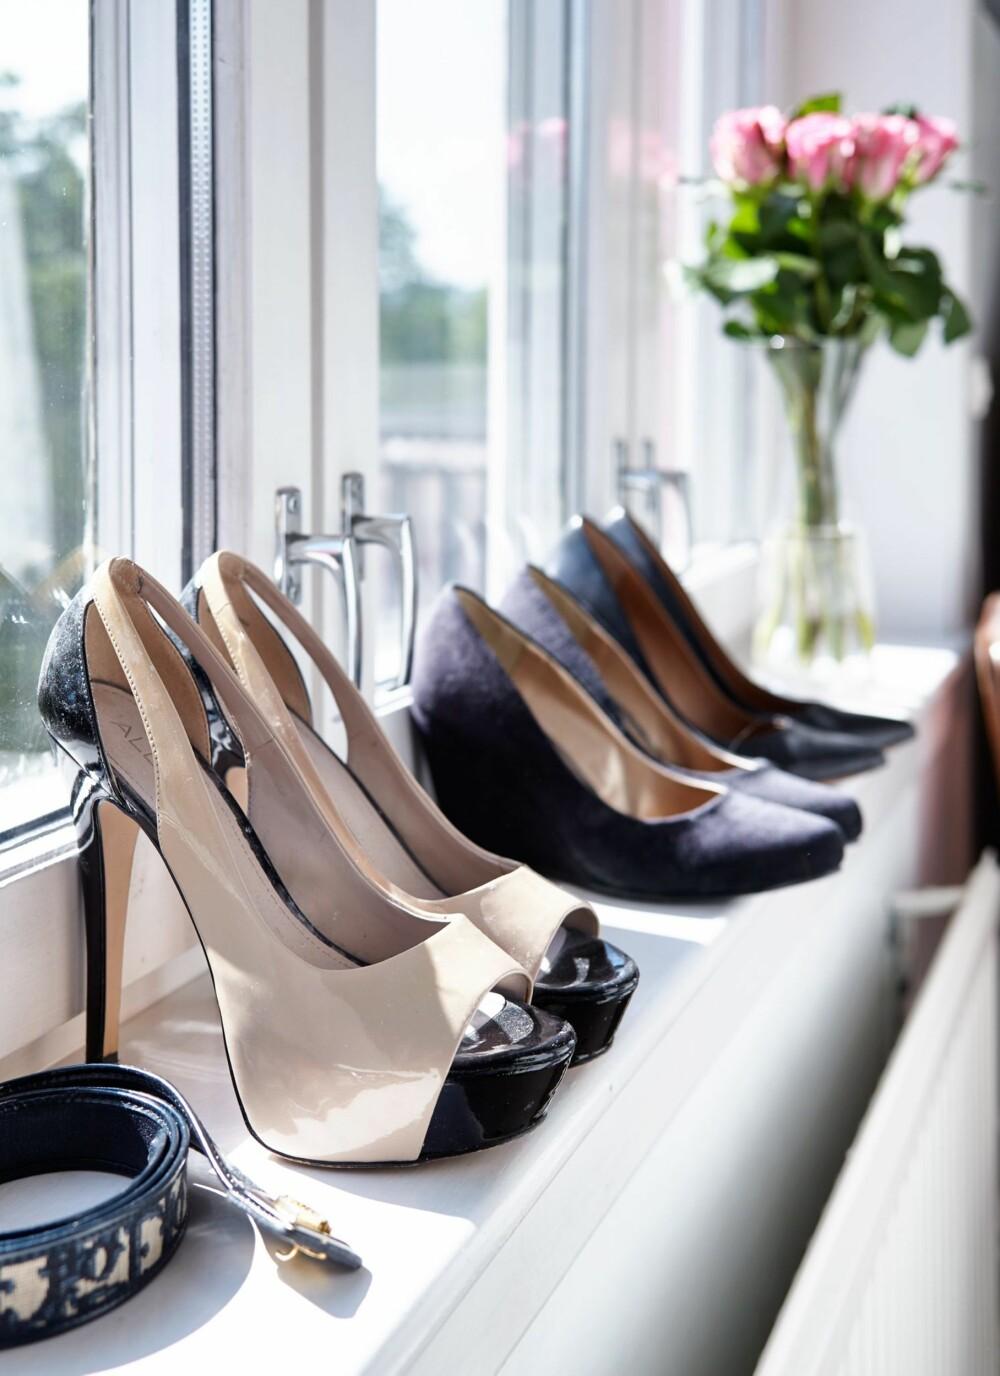 PÅ UTSTILLING: I vinduskarmen har fine sko fått plass.